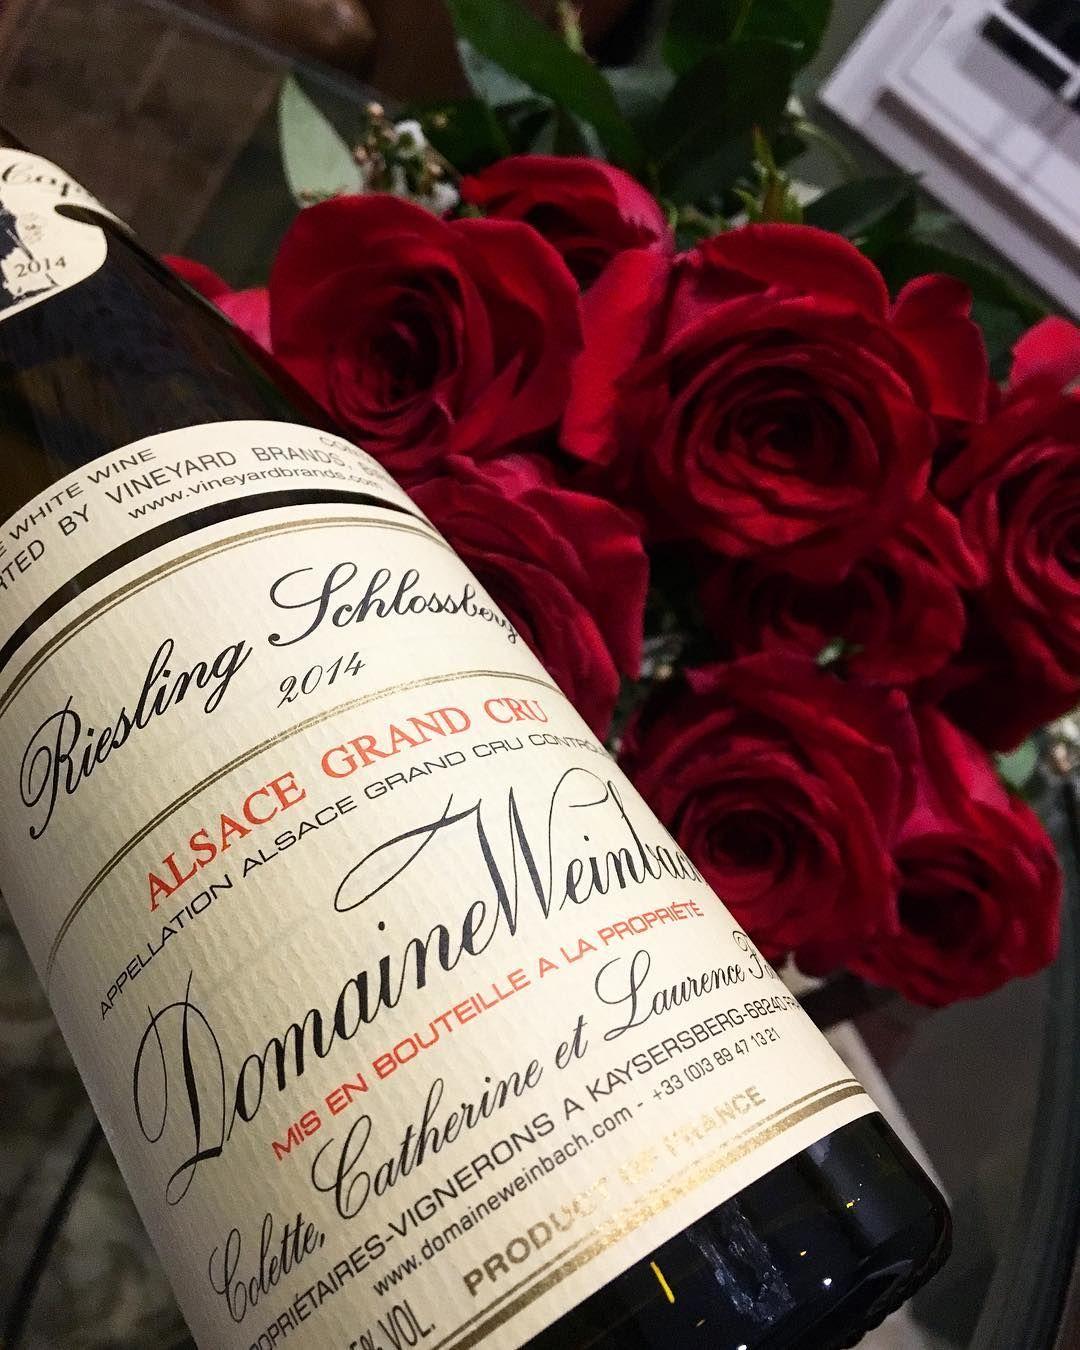 2014 Domaine Weinbach Schlossberg Grand Cru Riesling Alsace Riesling Riesling Wine Alsace